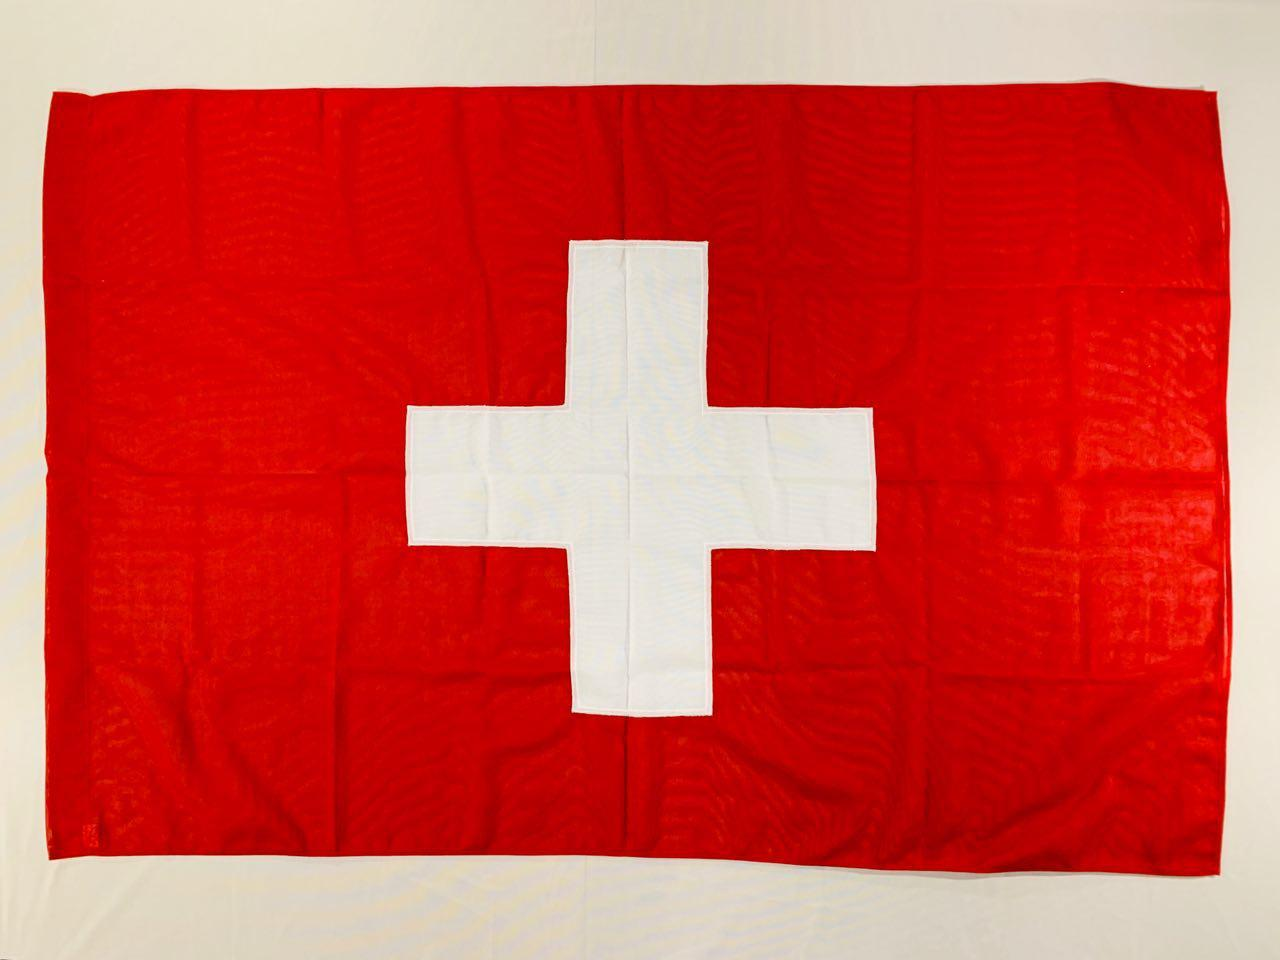 Флаг Швейцарии (Аппликация) - (1м*1.5м)